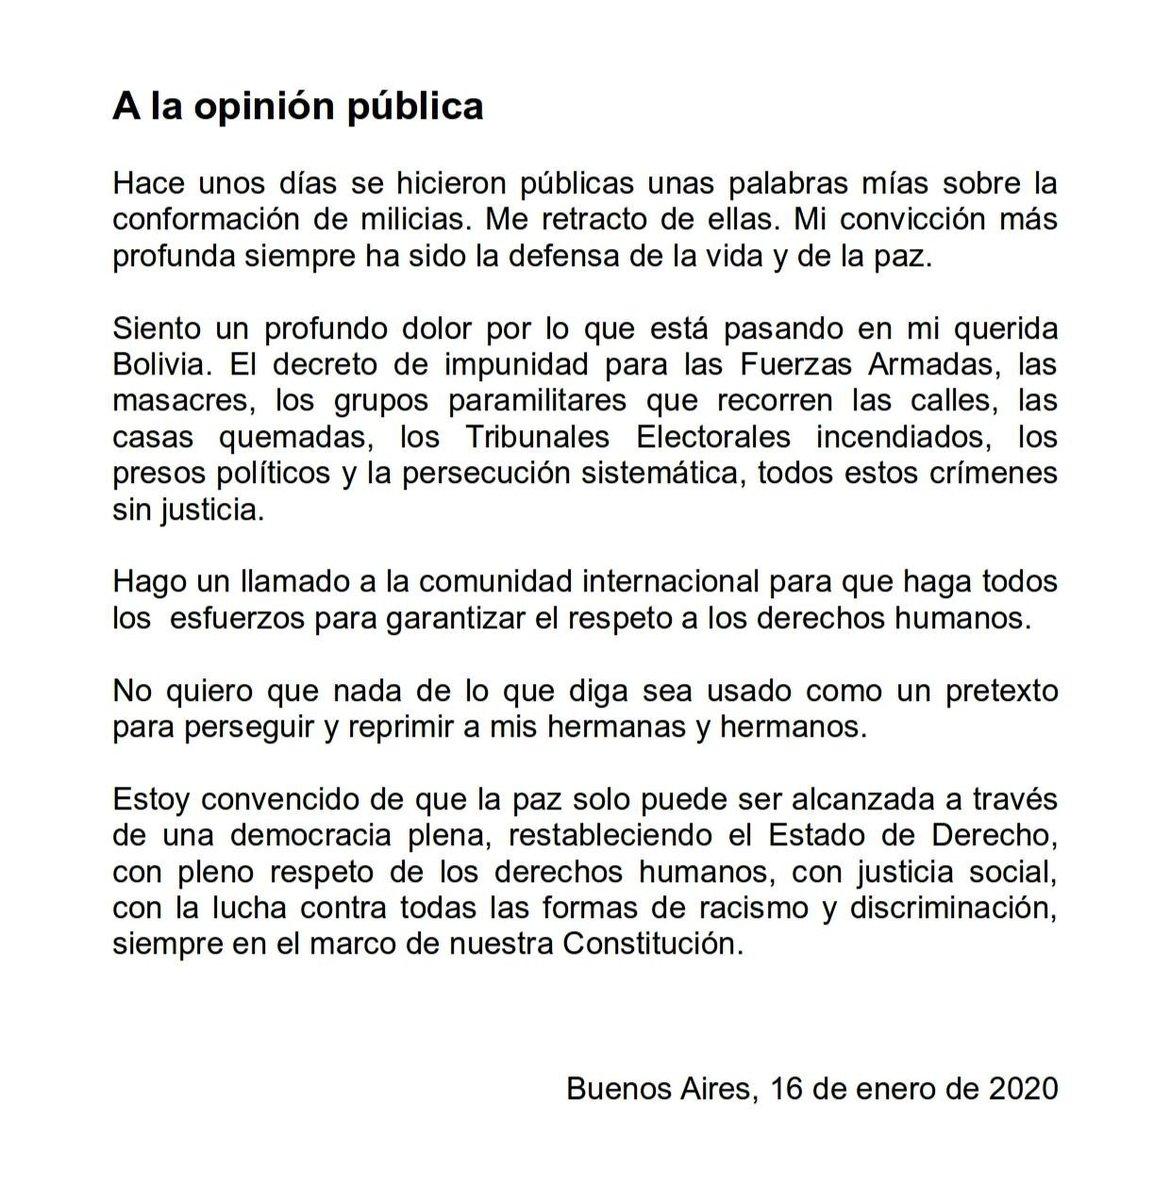 Evo Morales retracts call for 'armed militias' in Bolivia